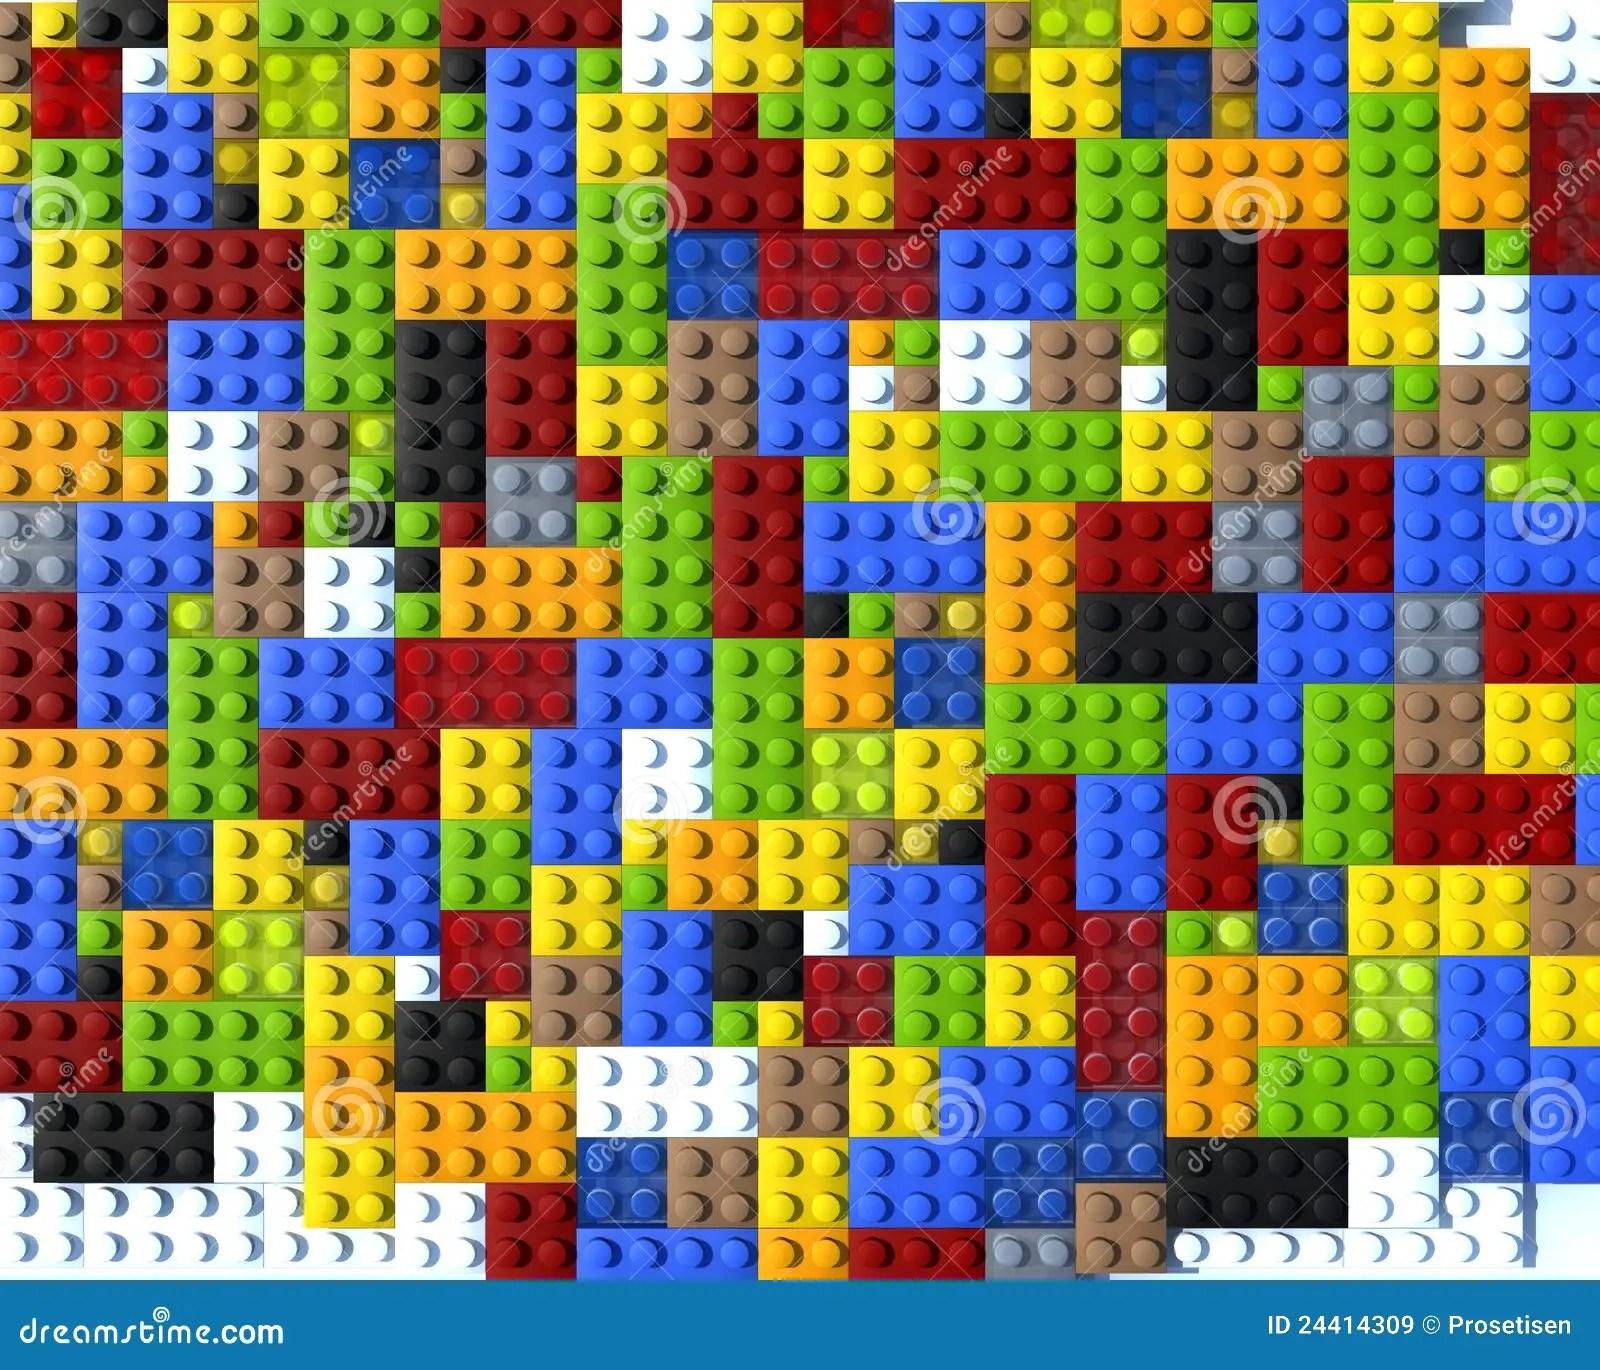 Building Construction Wallpaper Hd Colour Lego Blocks Flat Stock Illustration Image Of Style